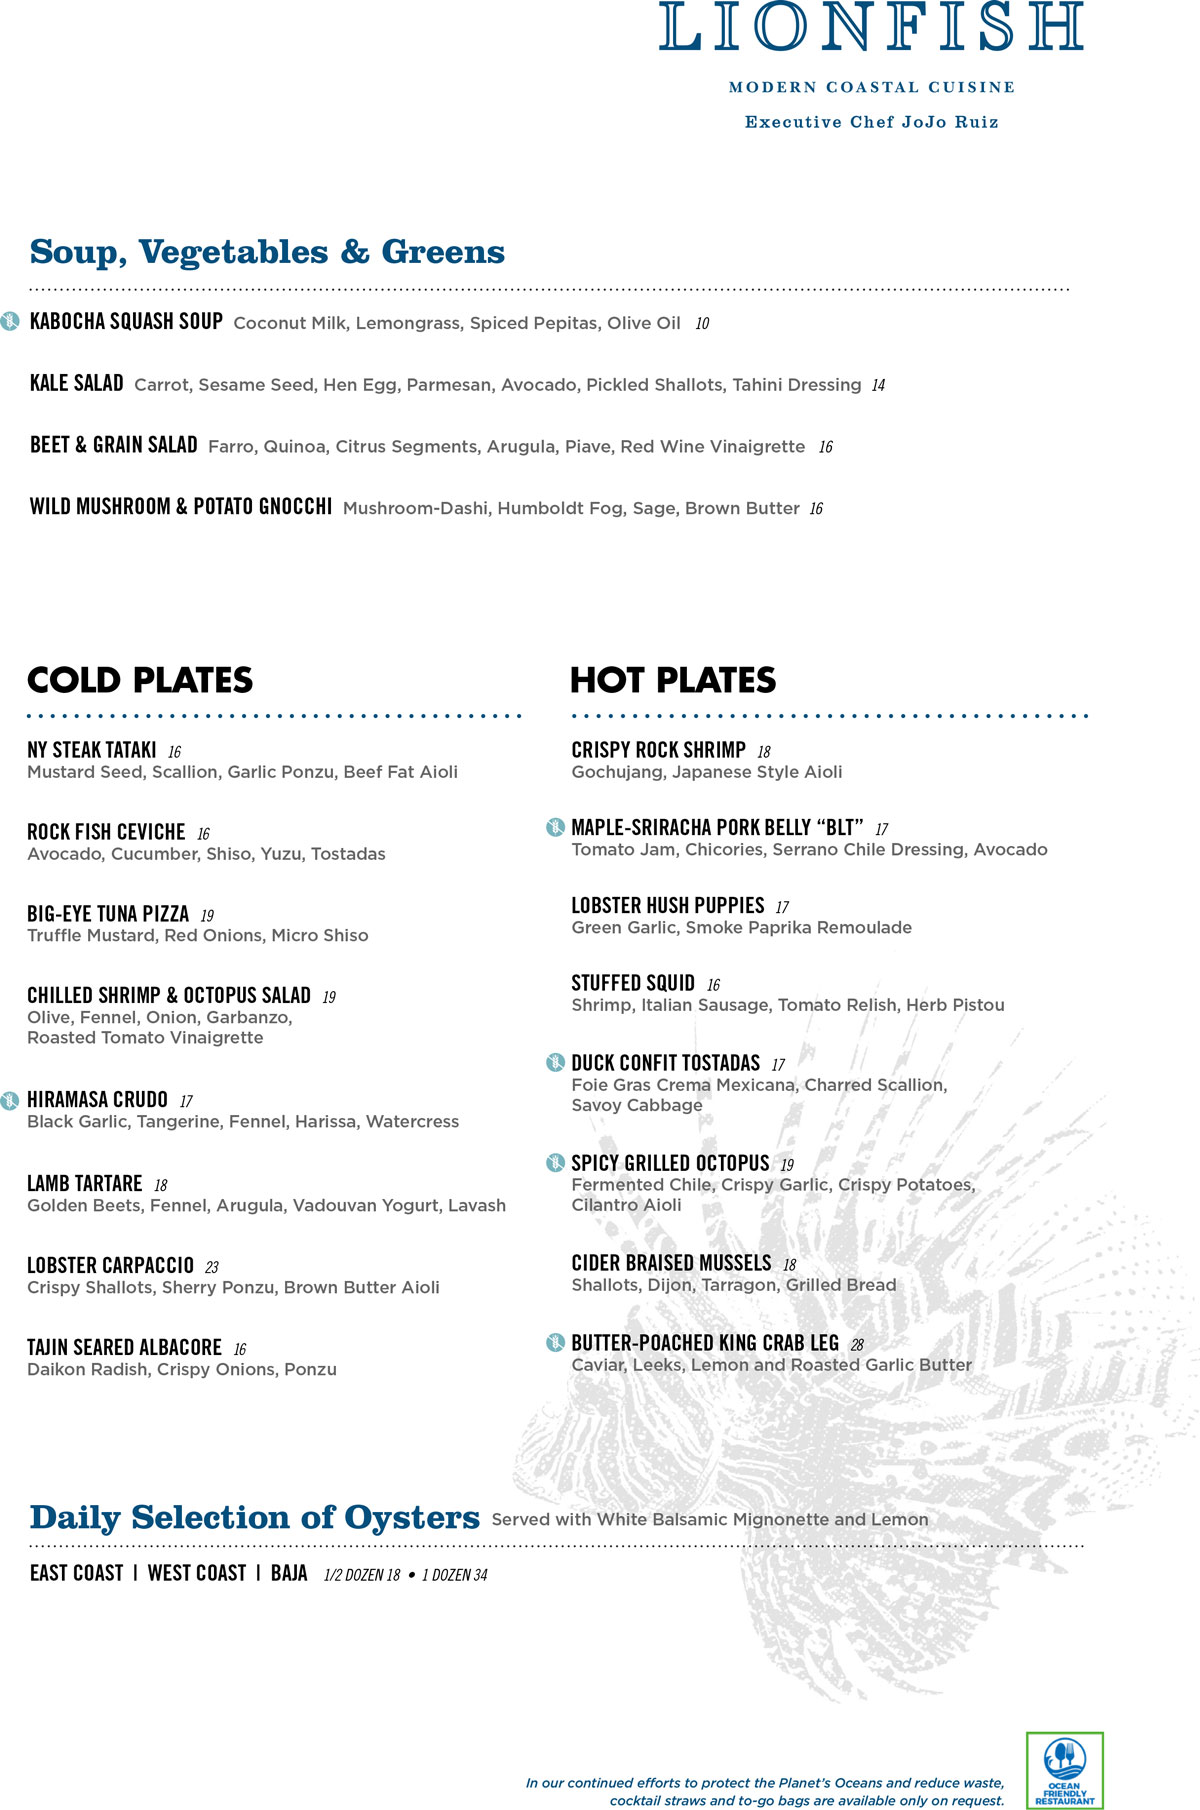 Lionfish San Diego Seafood Restaurant Menu 1